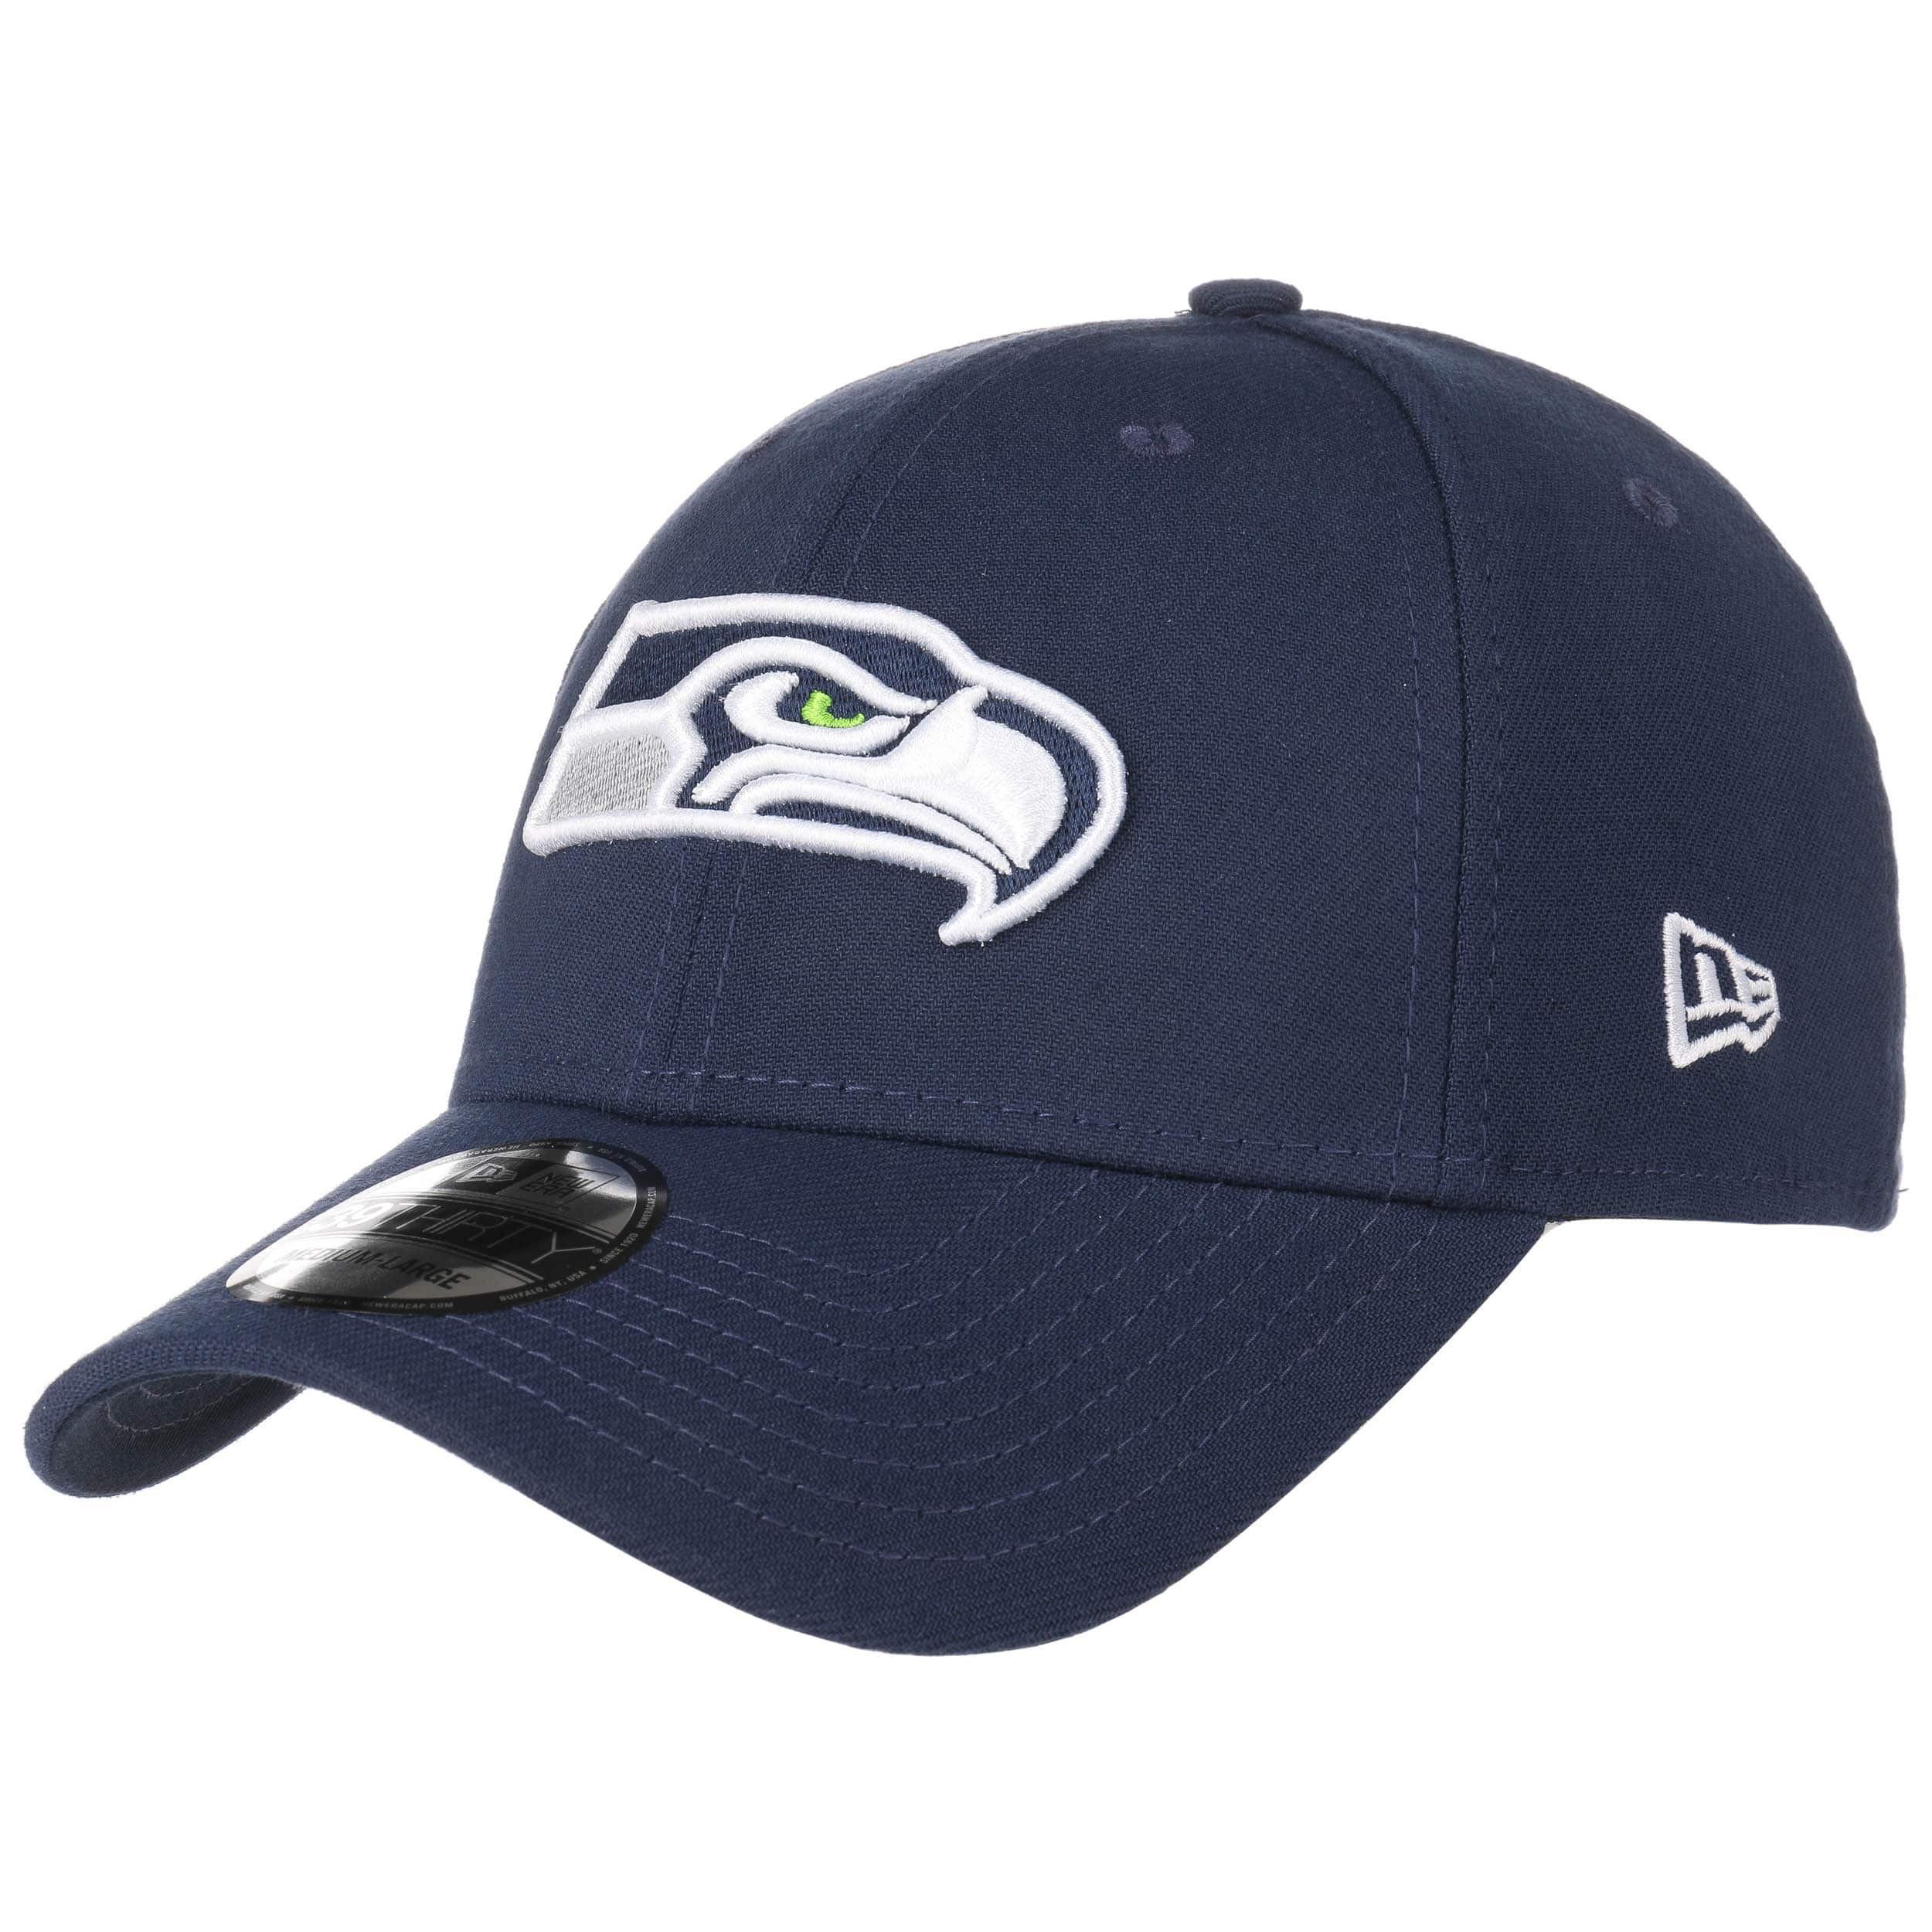 LIPODO Mesh Cap mit Nackenschutz Basecap Baseballcap Meshcap Fullcap